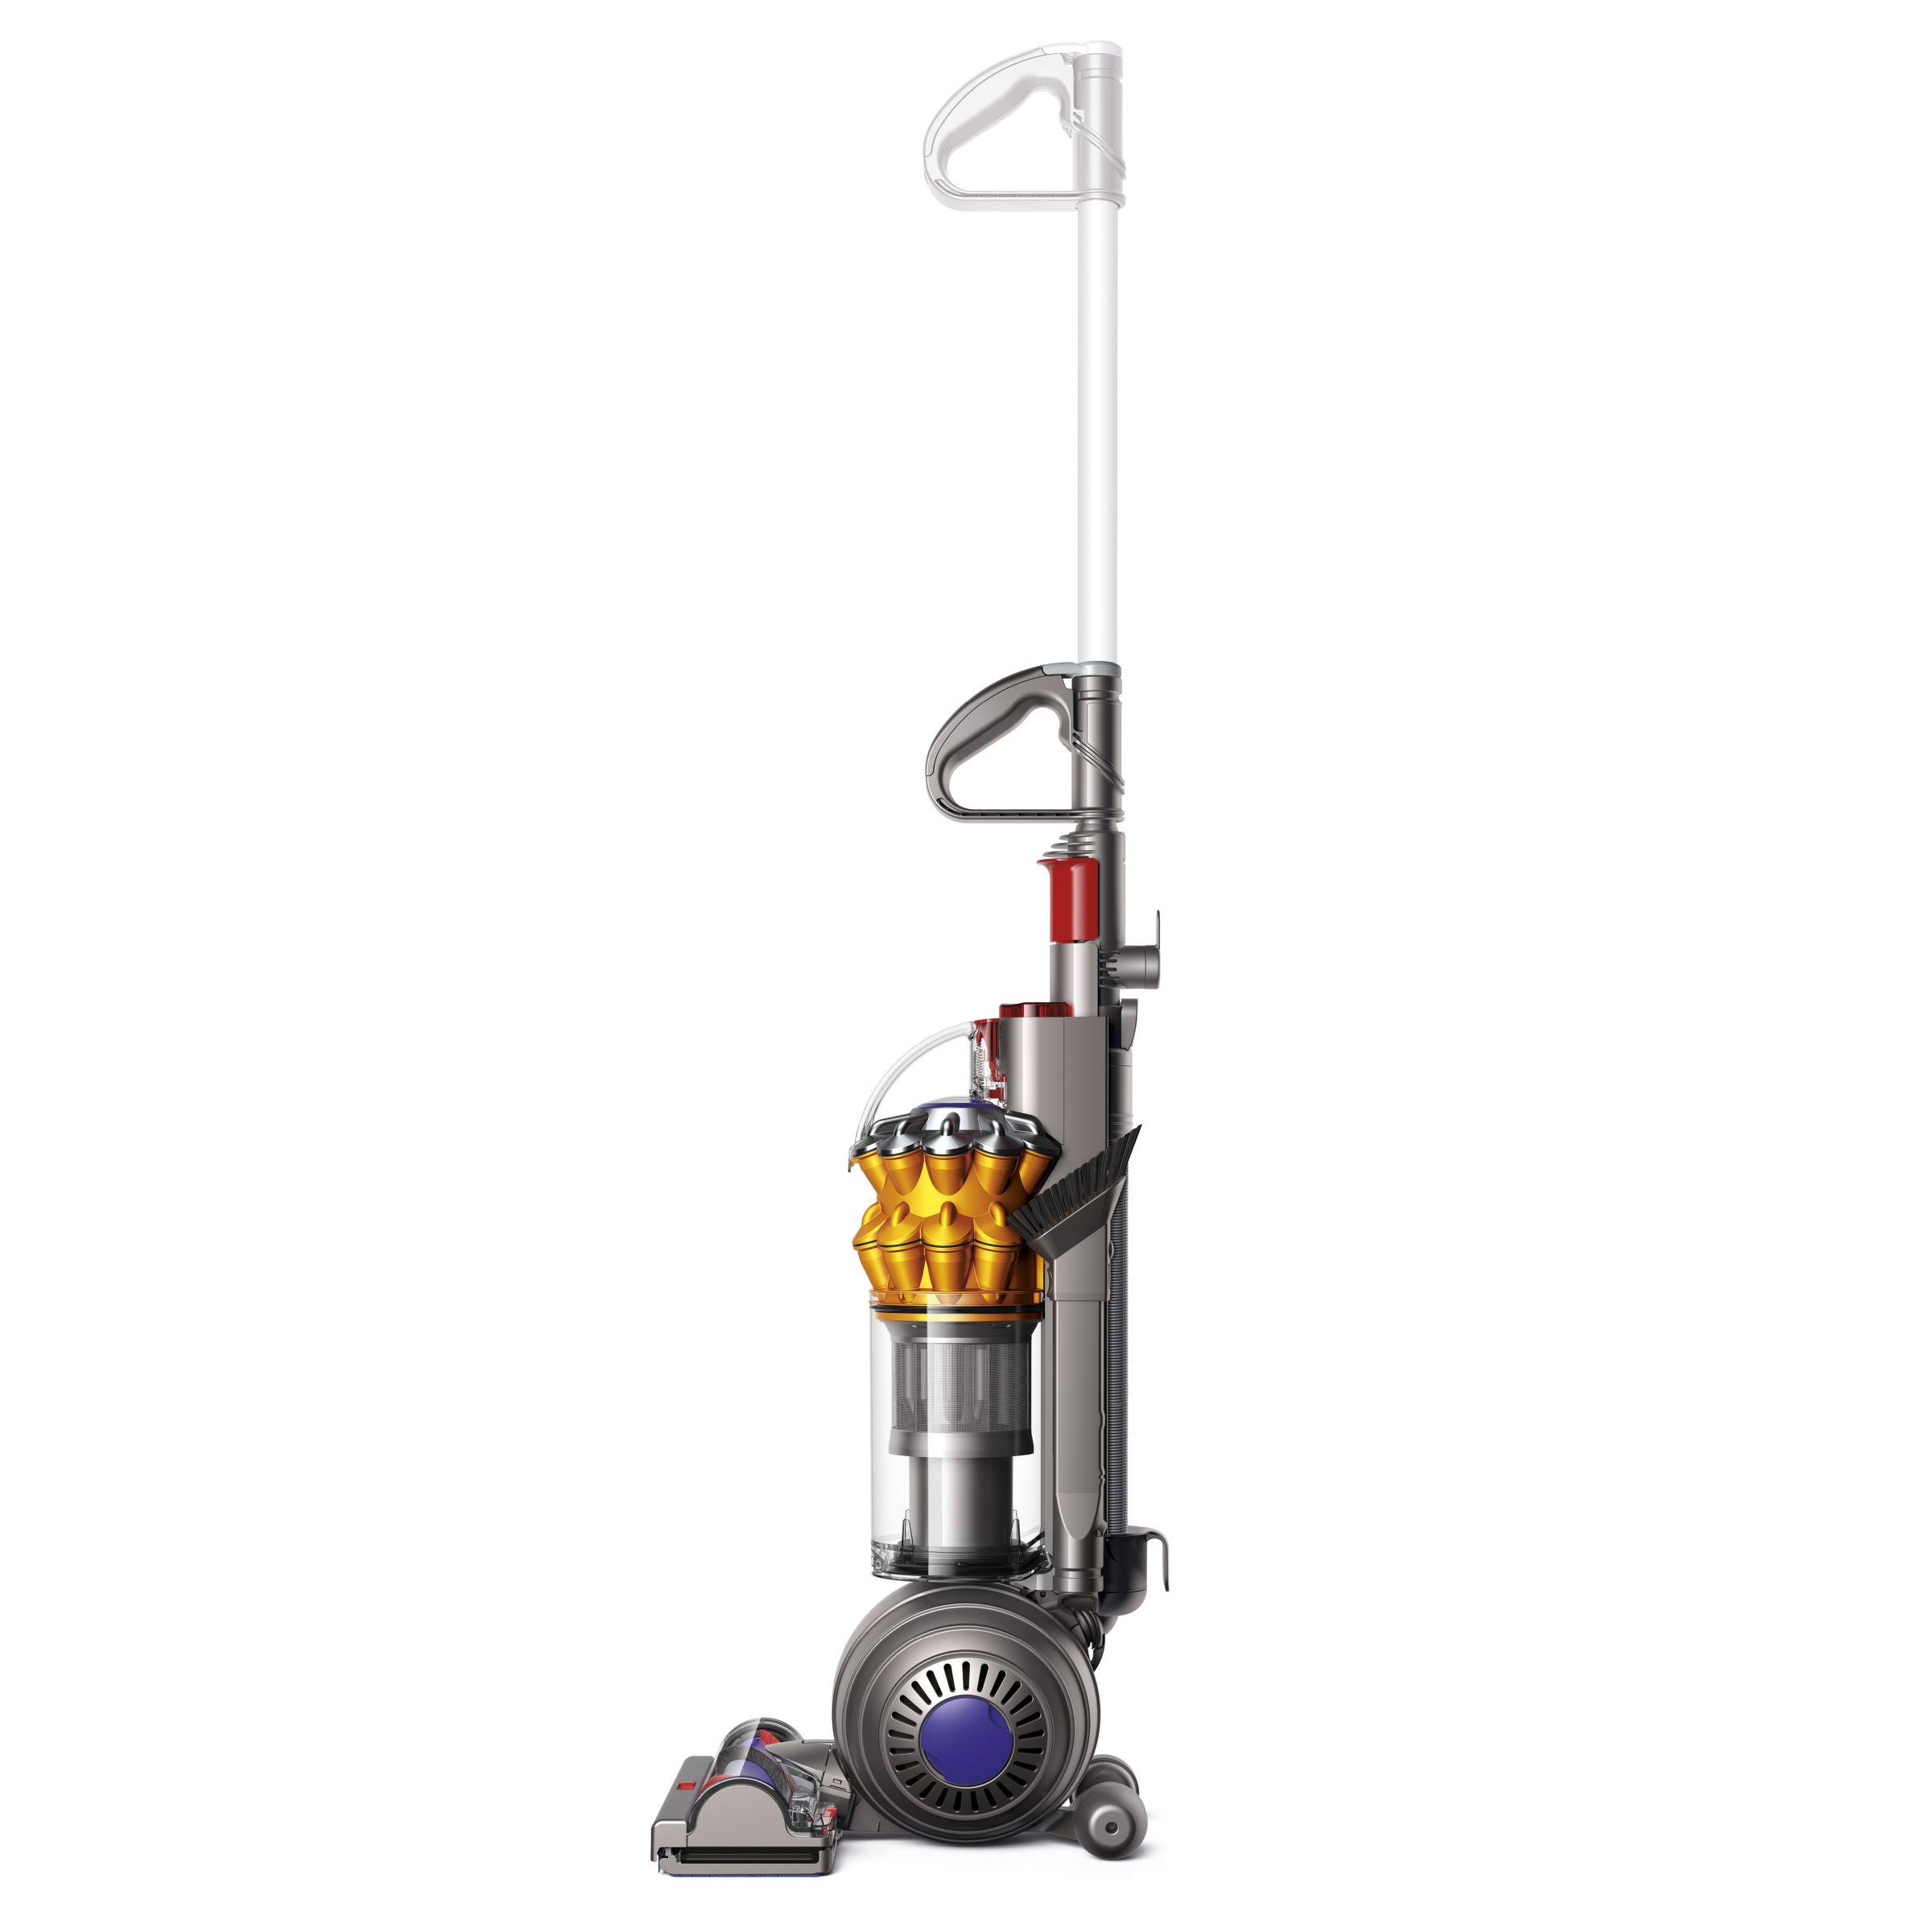 vacuum floorcare cleaners small hughes shk floor dyson multi ball appliances